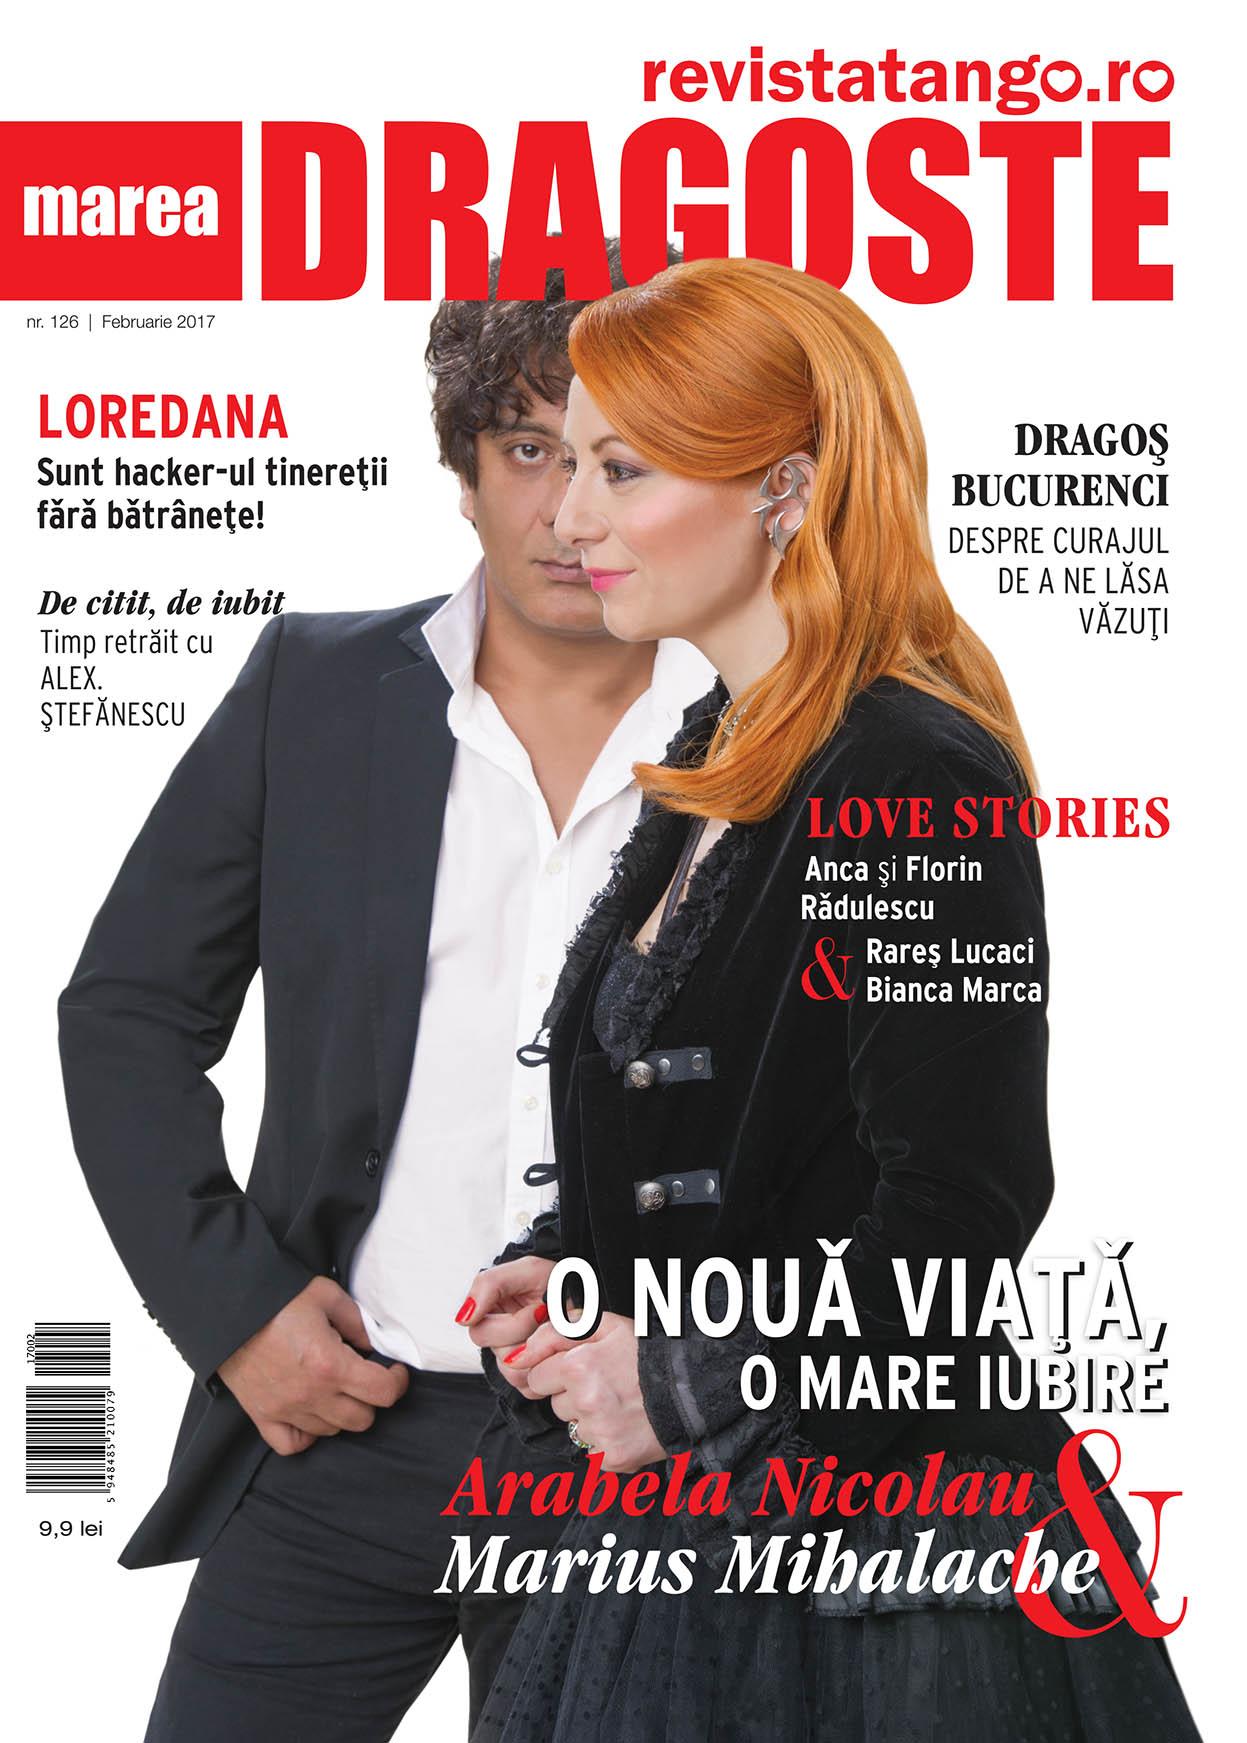 Arabela Nicolau si Marius Mihalache pe coperta Marea Dragoste-revistatango.ro, nr. 126, februarie 2017